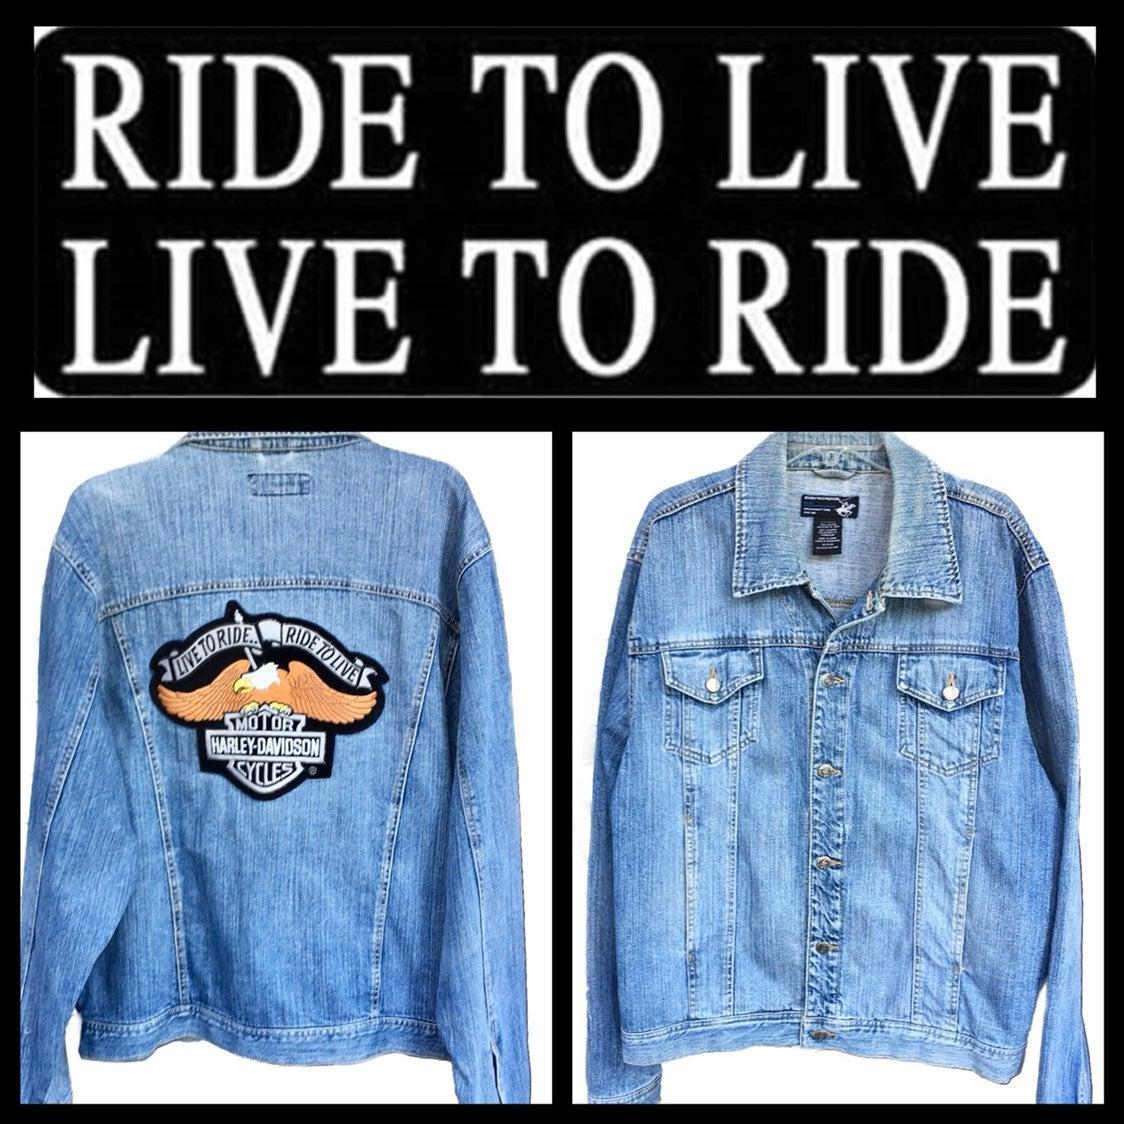 BH Polo Club Harley Davidson Jean Jkt XL